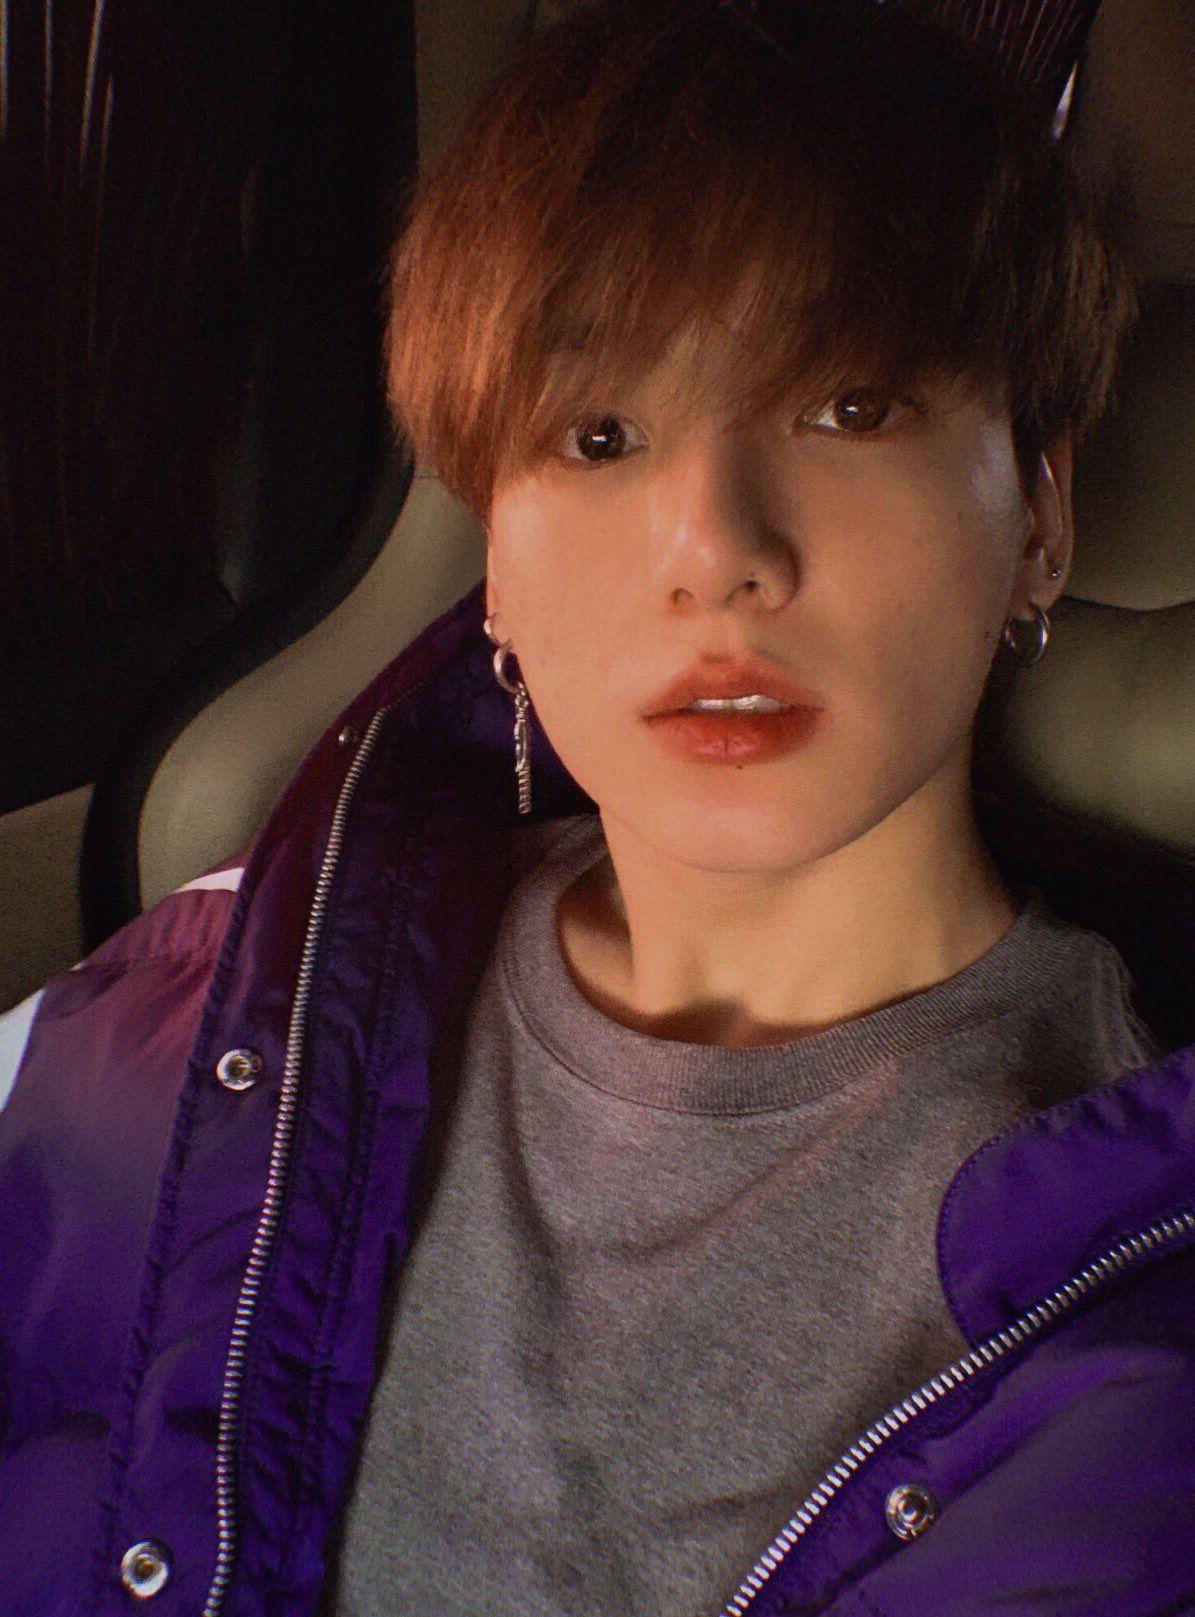 #jungkook #jeonjungkook #bts #selca #selfie #twitter #btsselca